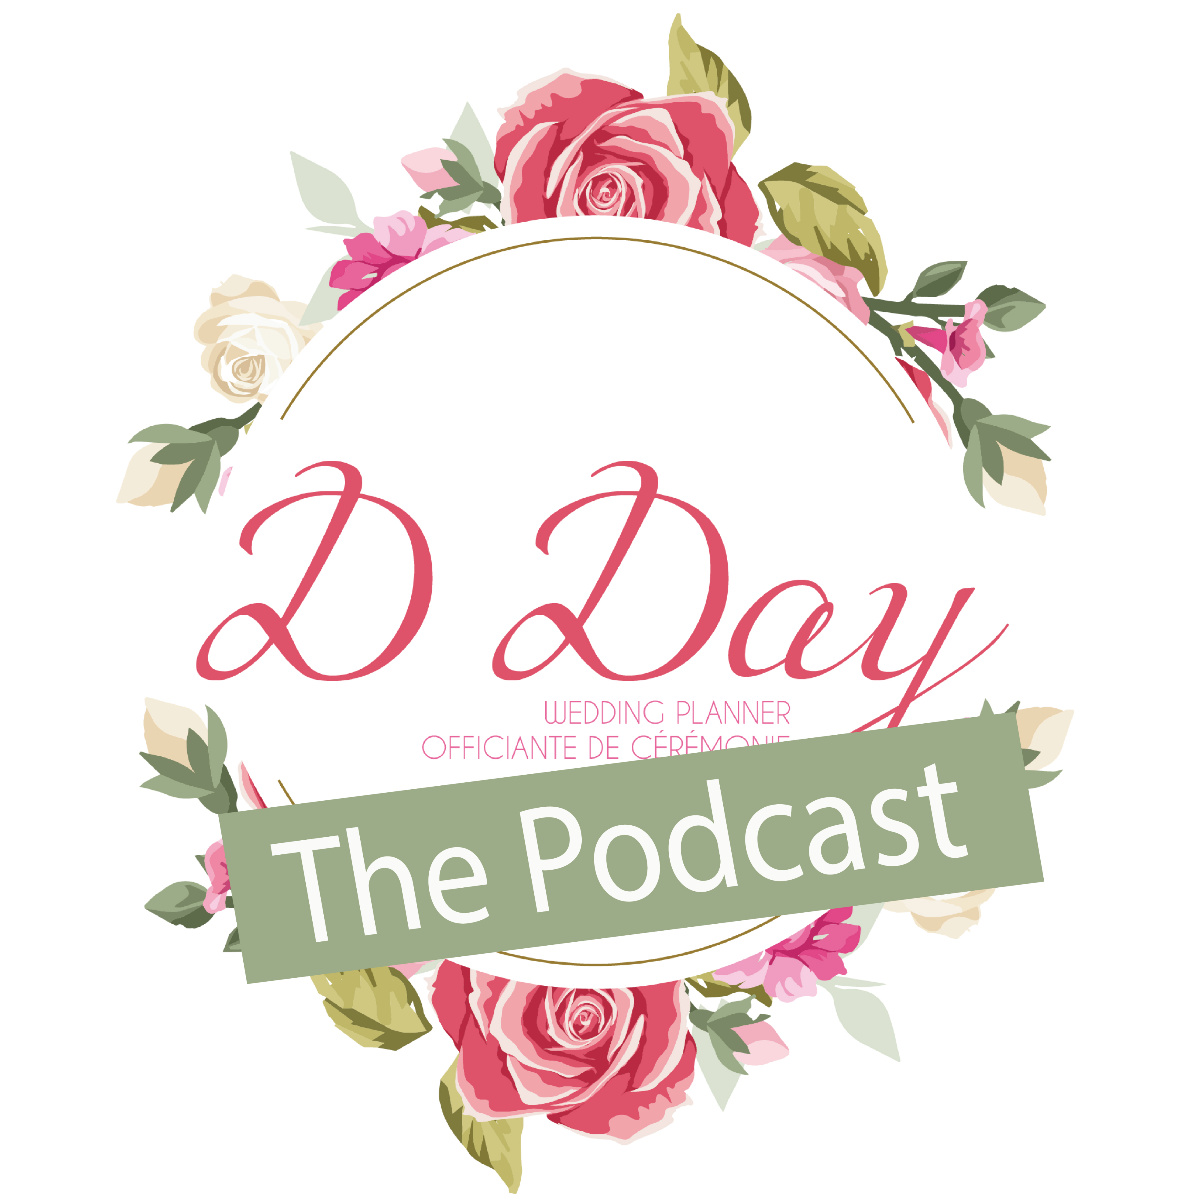 podcast wedding planner dday organisation mariage france suisse europe